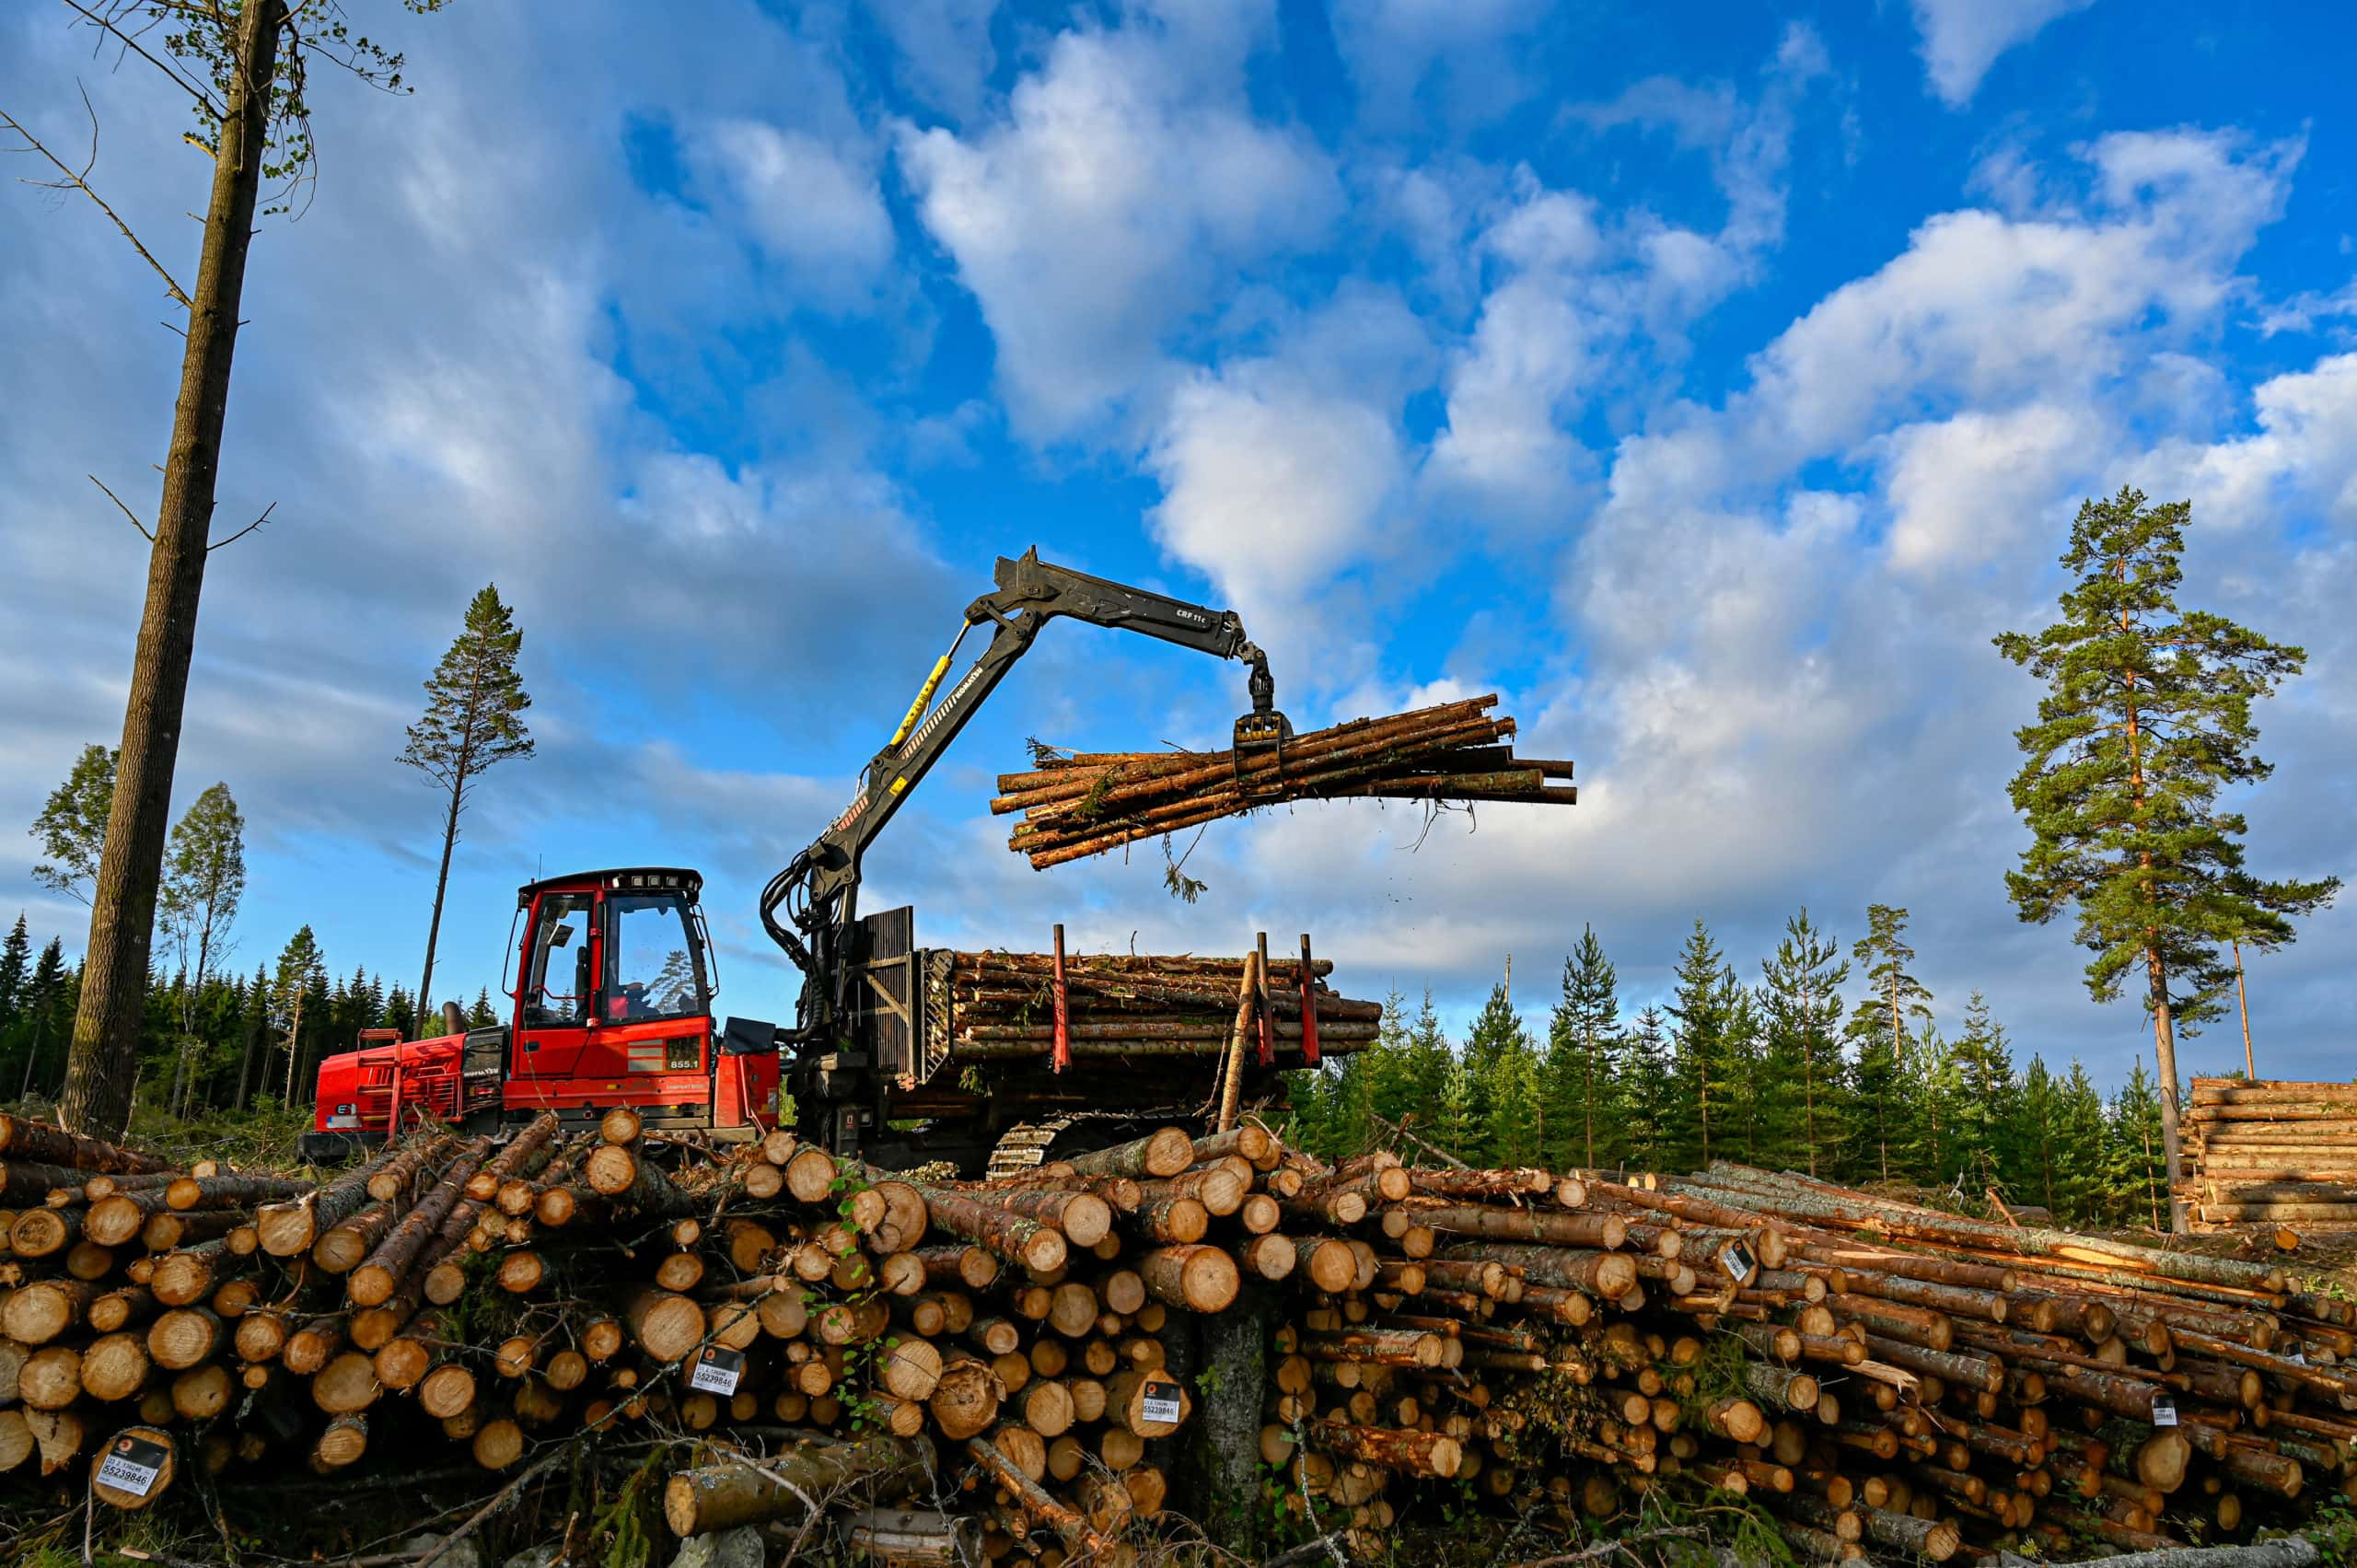 Komatsu forest machine lifting timber near Filipstad Sweden 19 September 2019